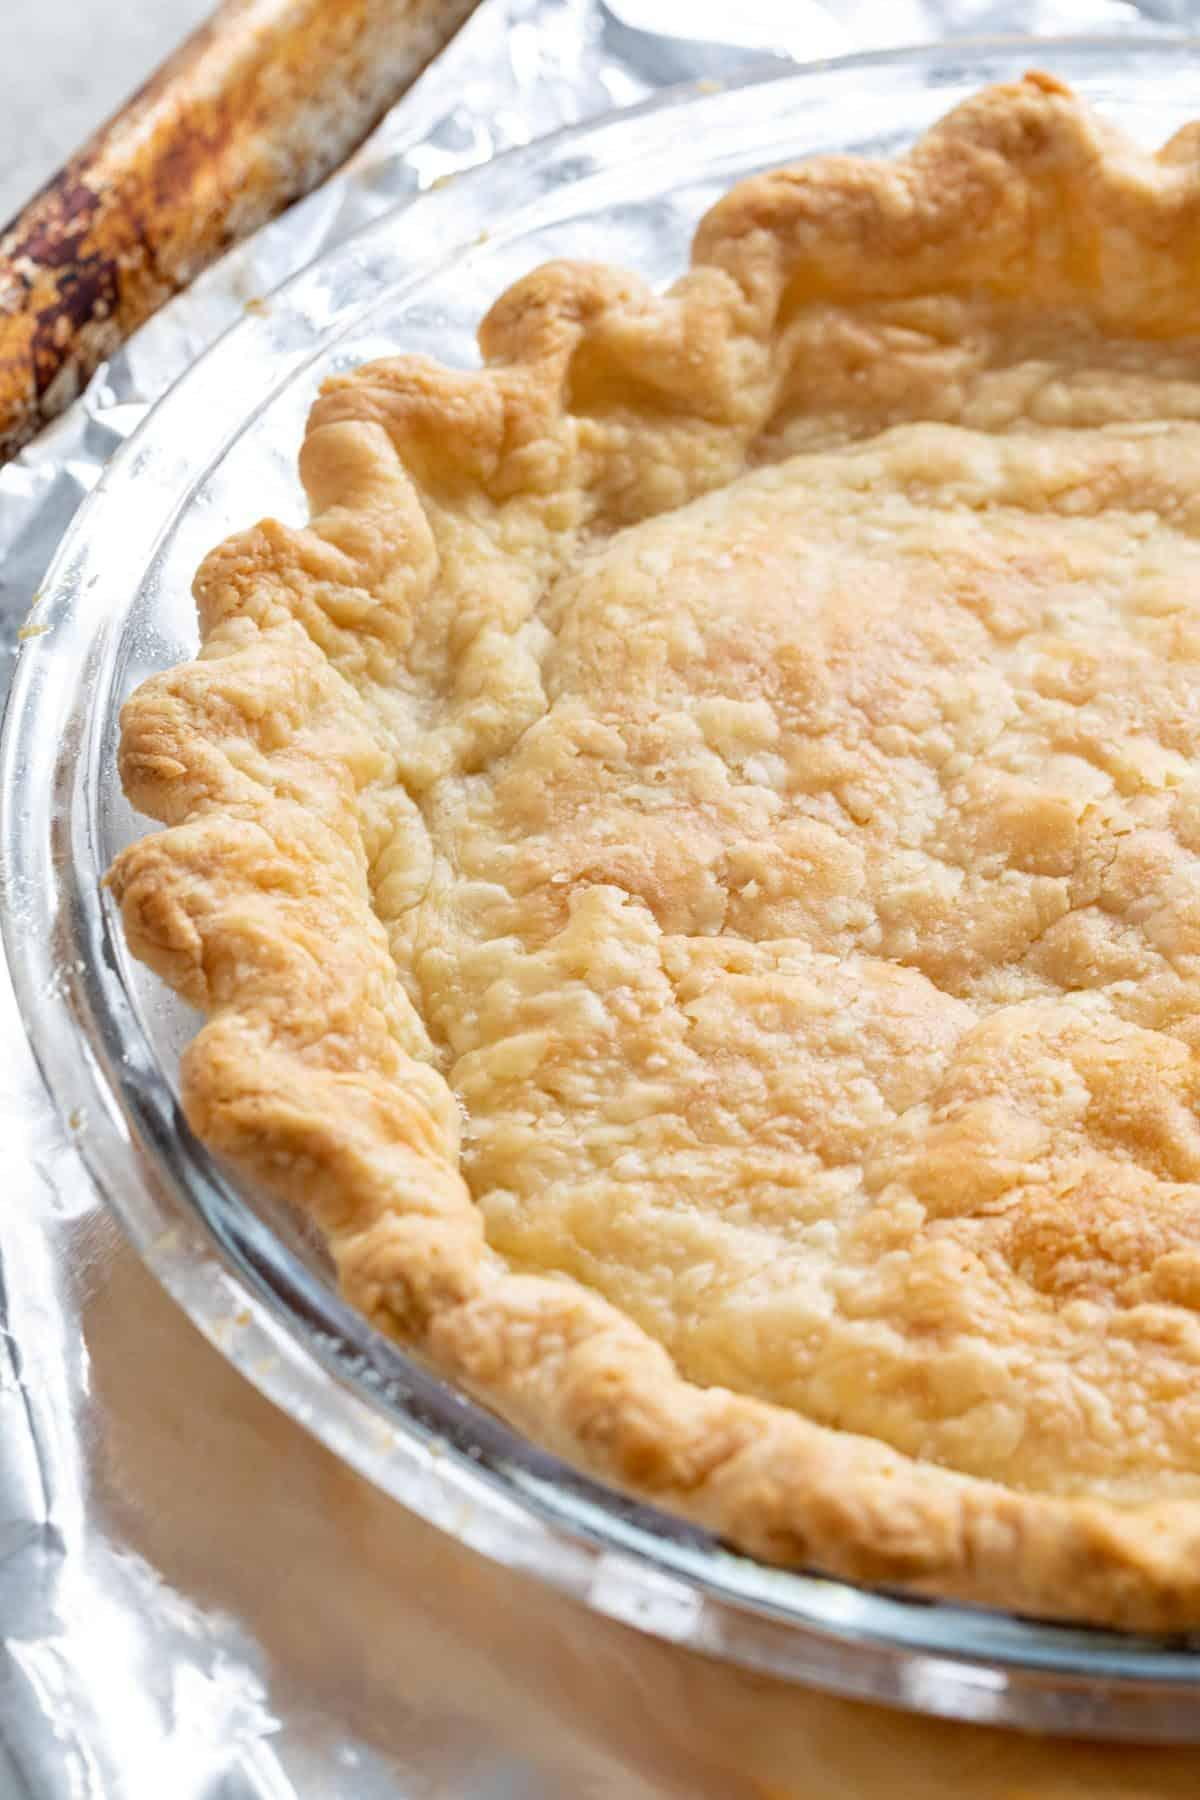 pie crust after blind baking